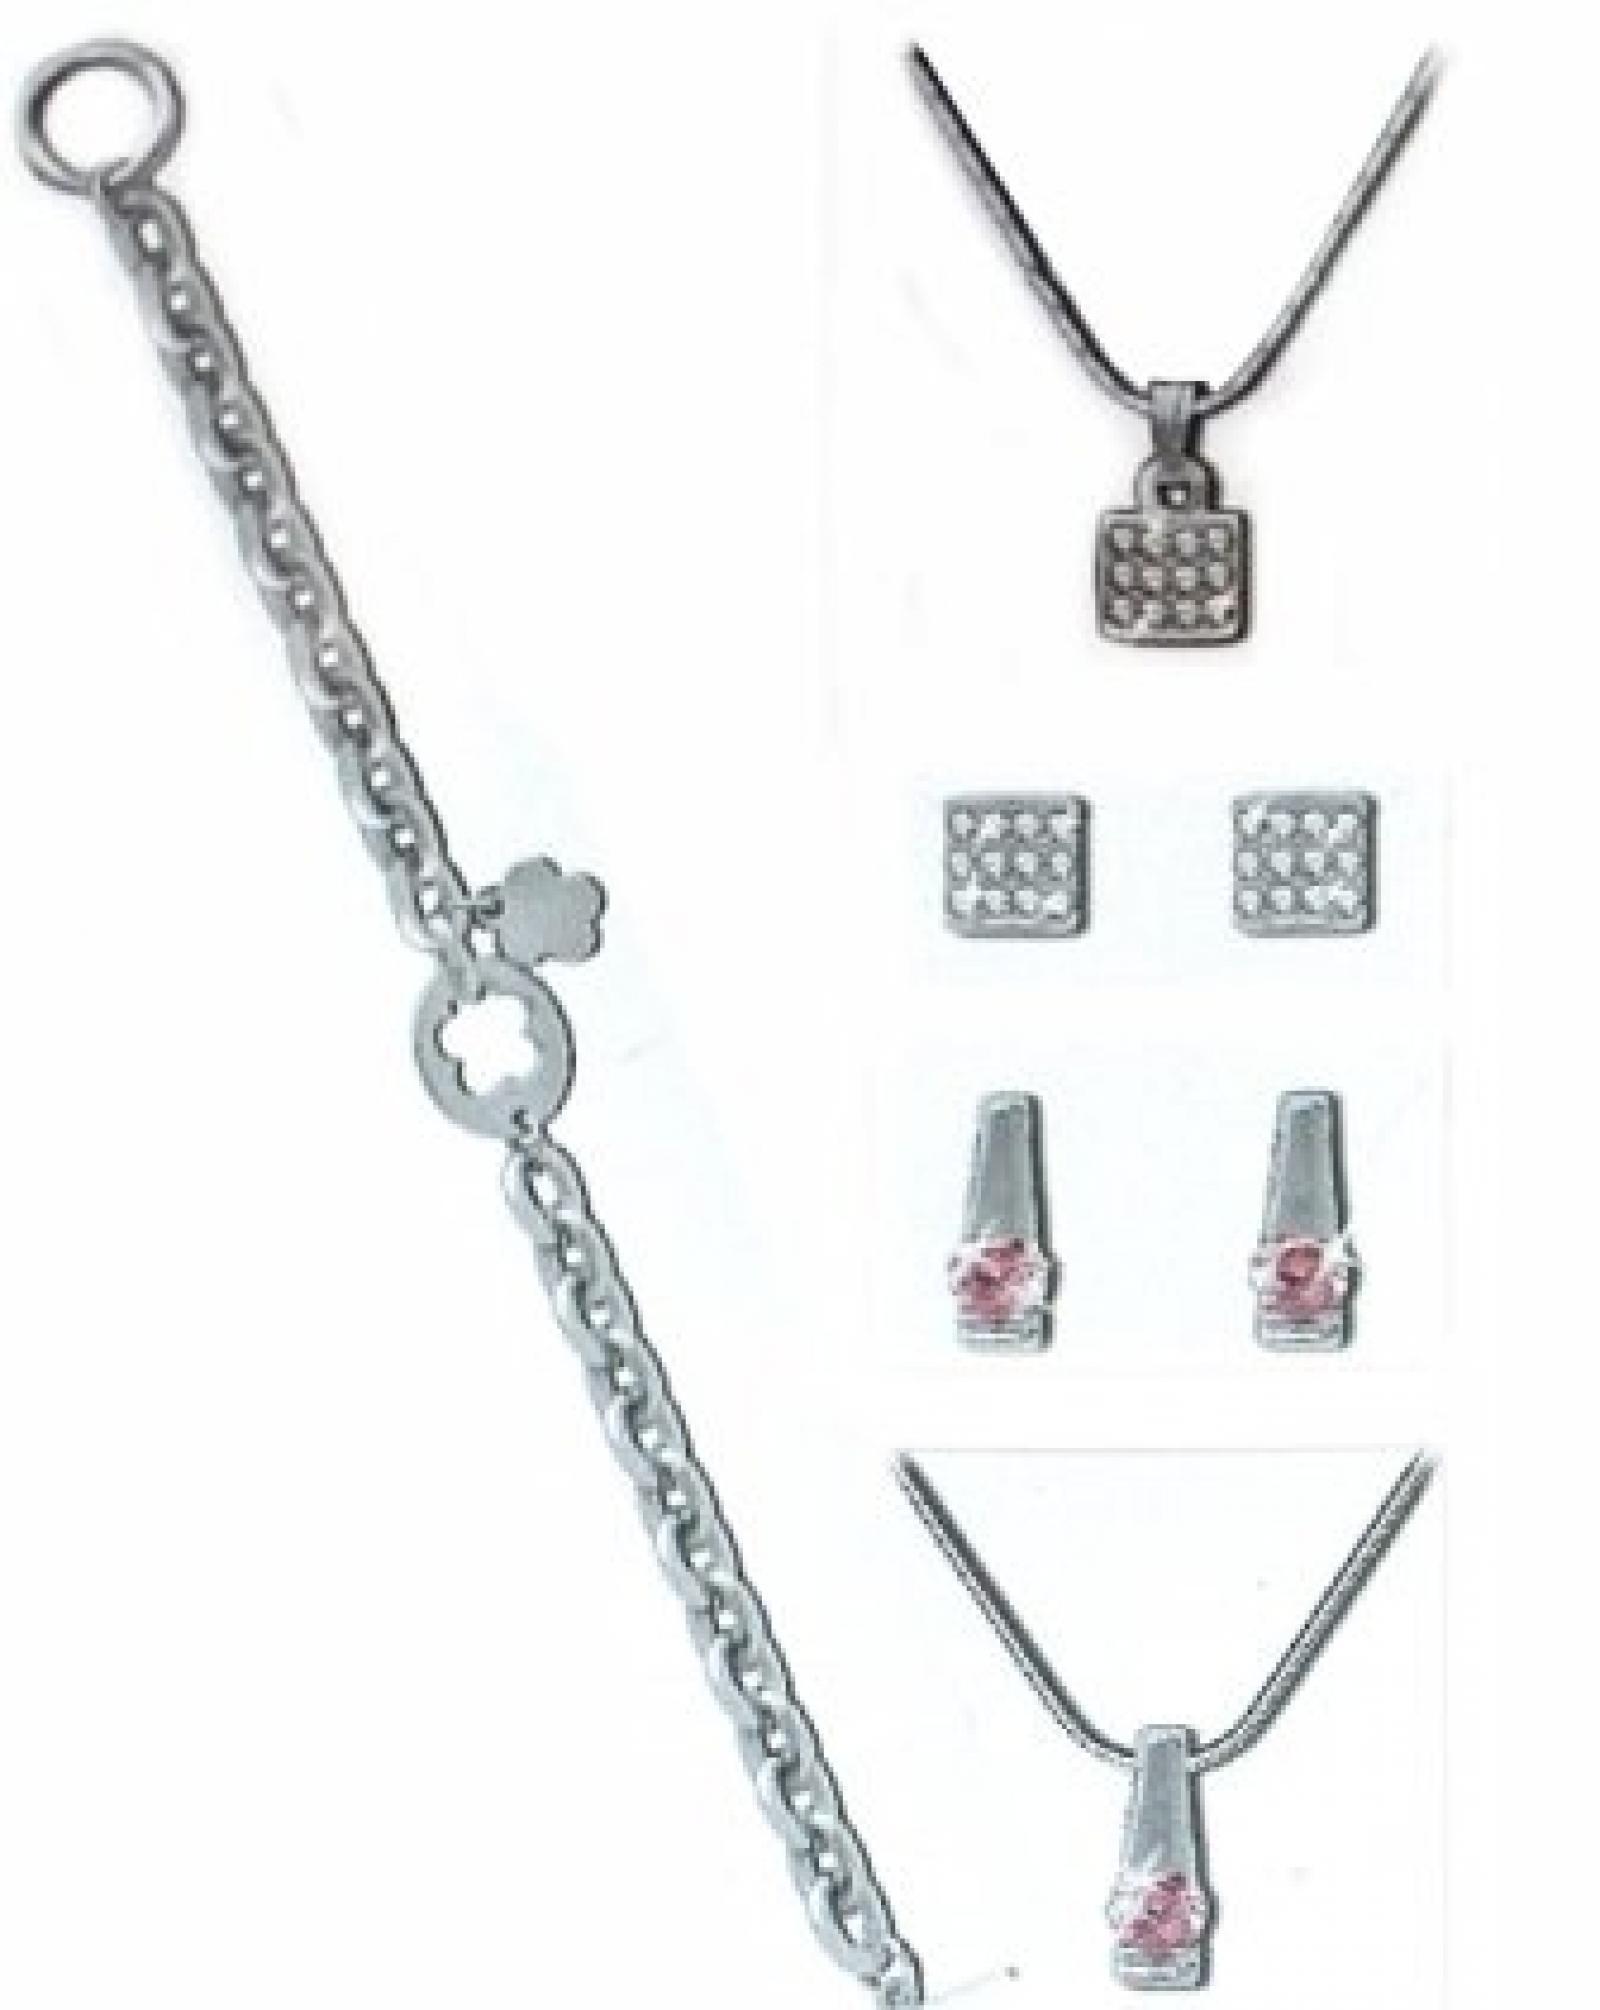 Pierre Cardin Damen Frauen Modeschmuck 2 Pendant Ohrringe & Halskette Schmuckset